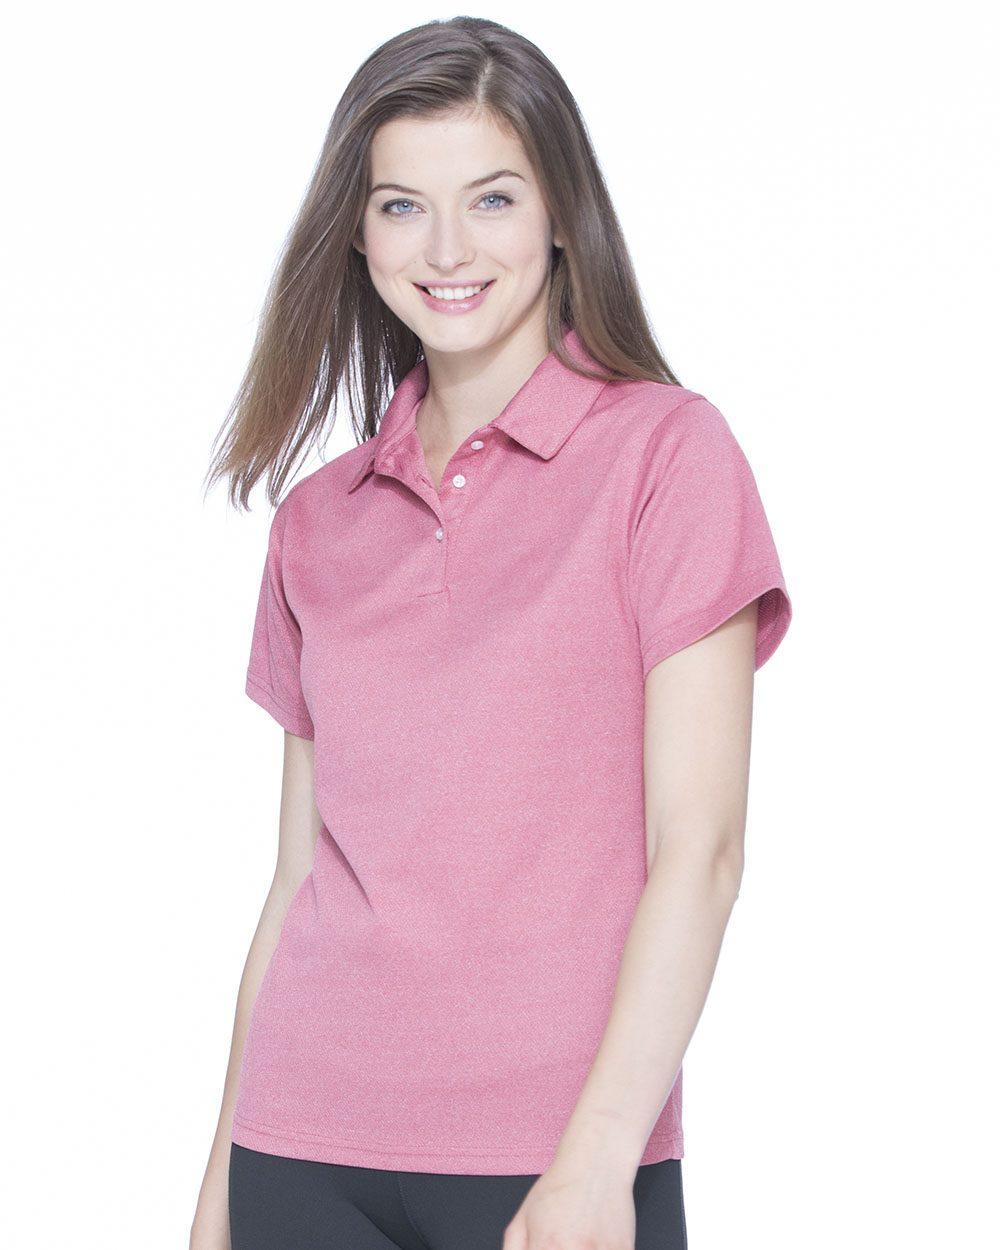 FeatherLite Women's Moisture Free Mesh Sport Shirt